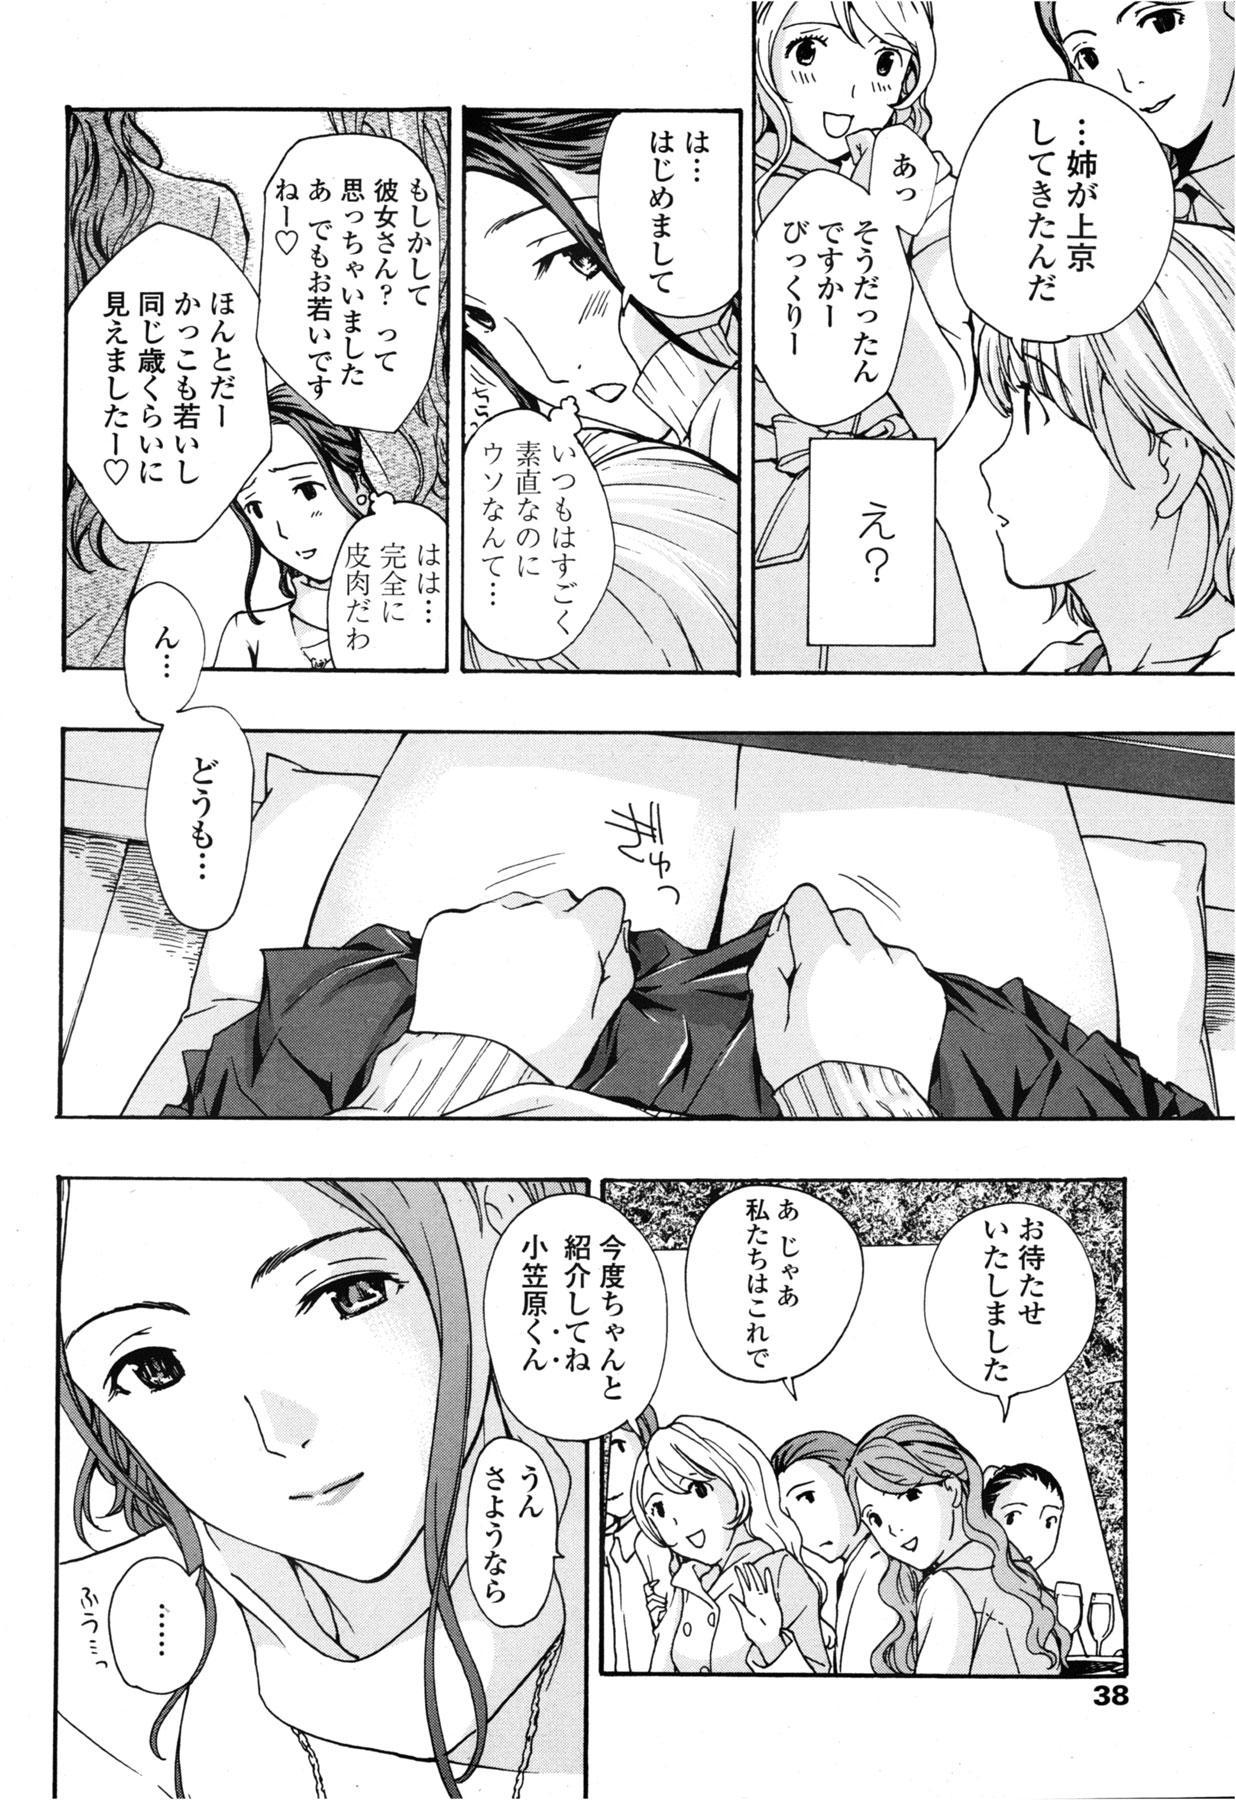 COMIC Penguin Club Sanzokuban 2013-02 39